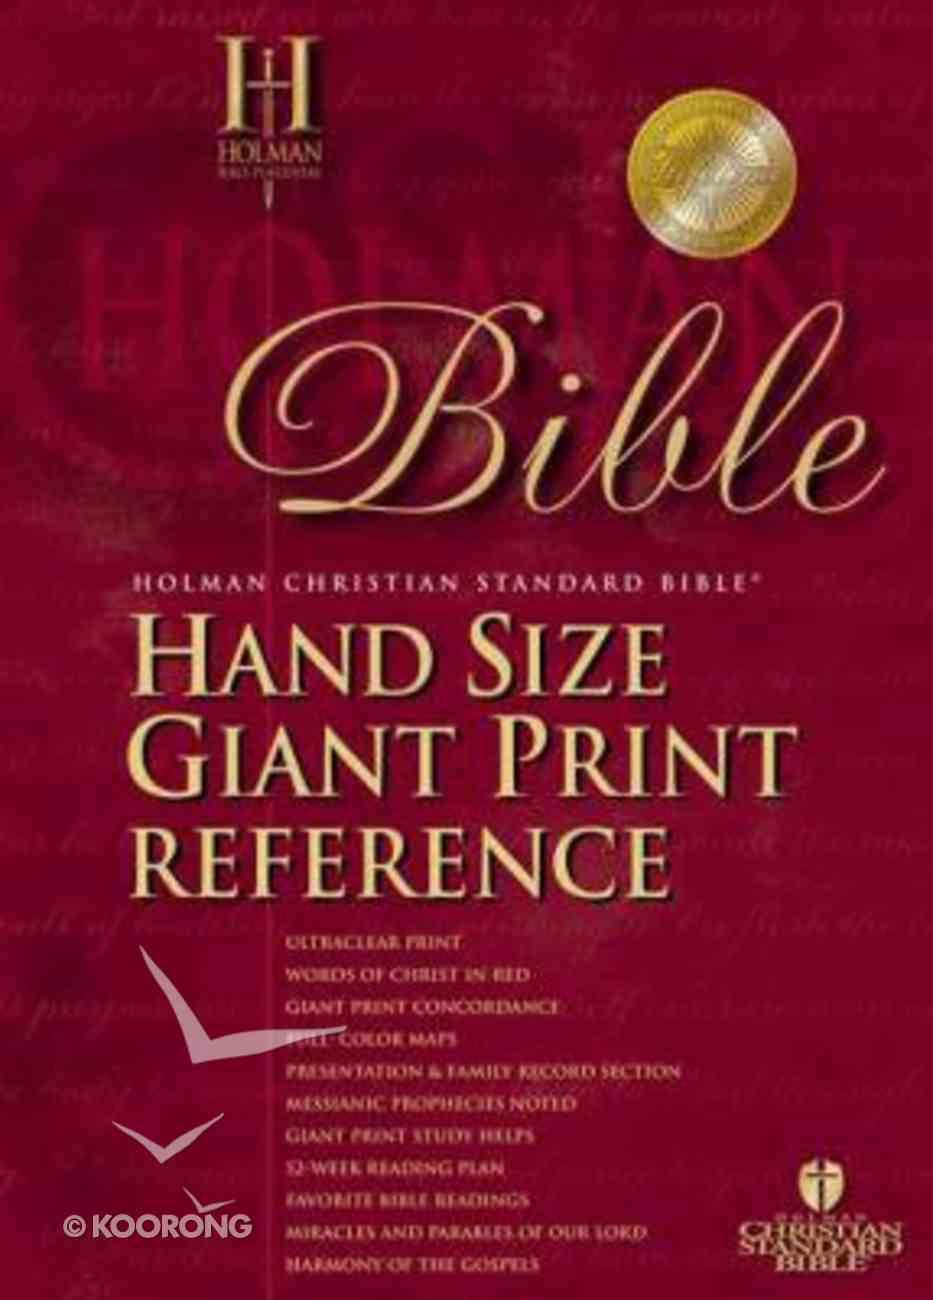 HCSB Hand Size Giant Print Reference Black Imitation Leather